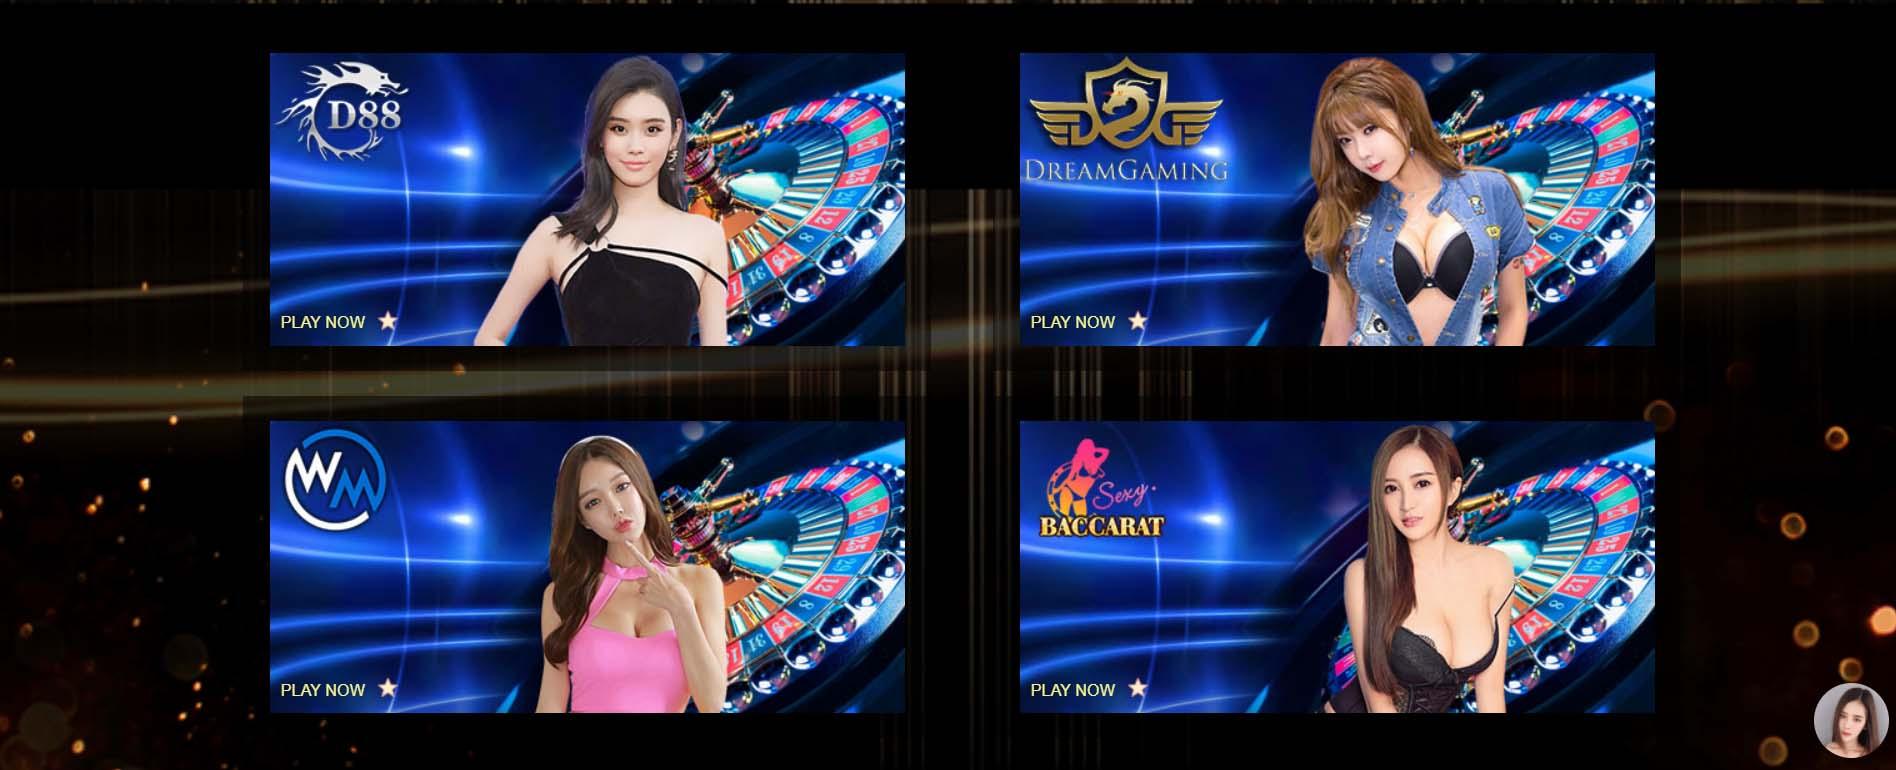 K9Win Online Casino Promotions